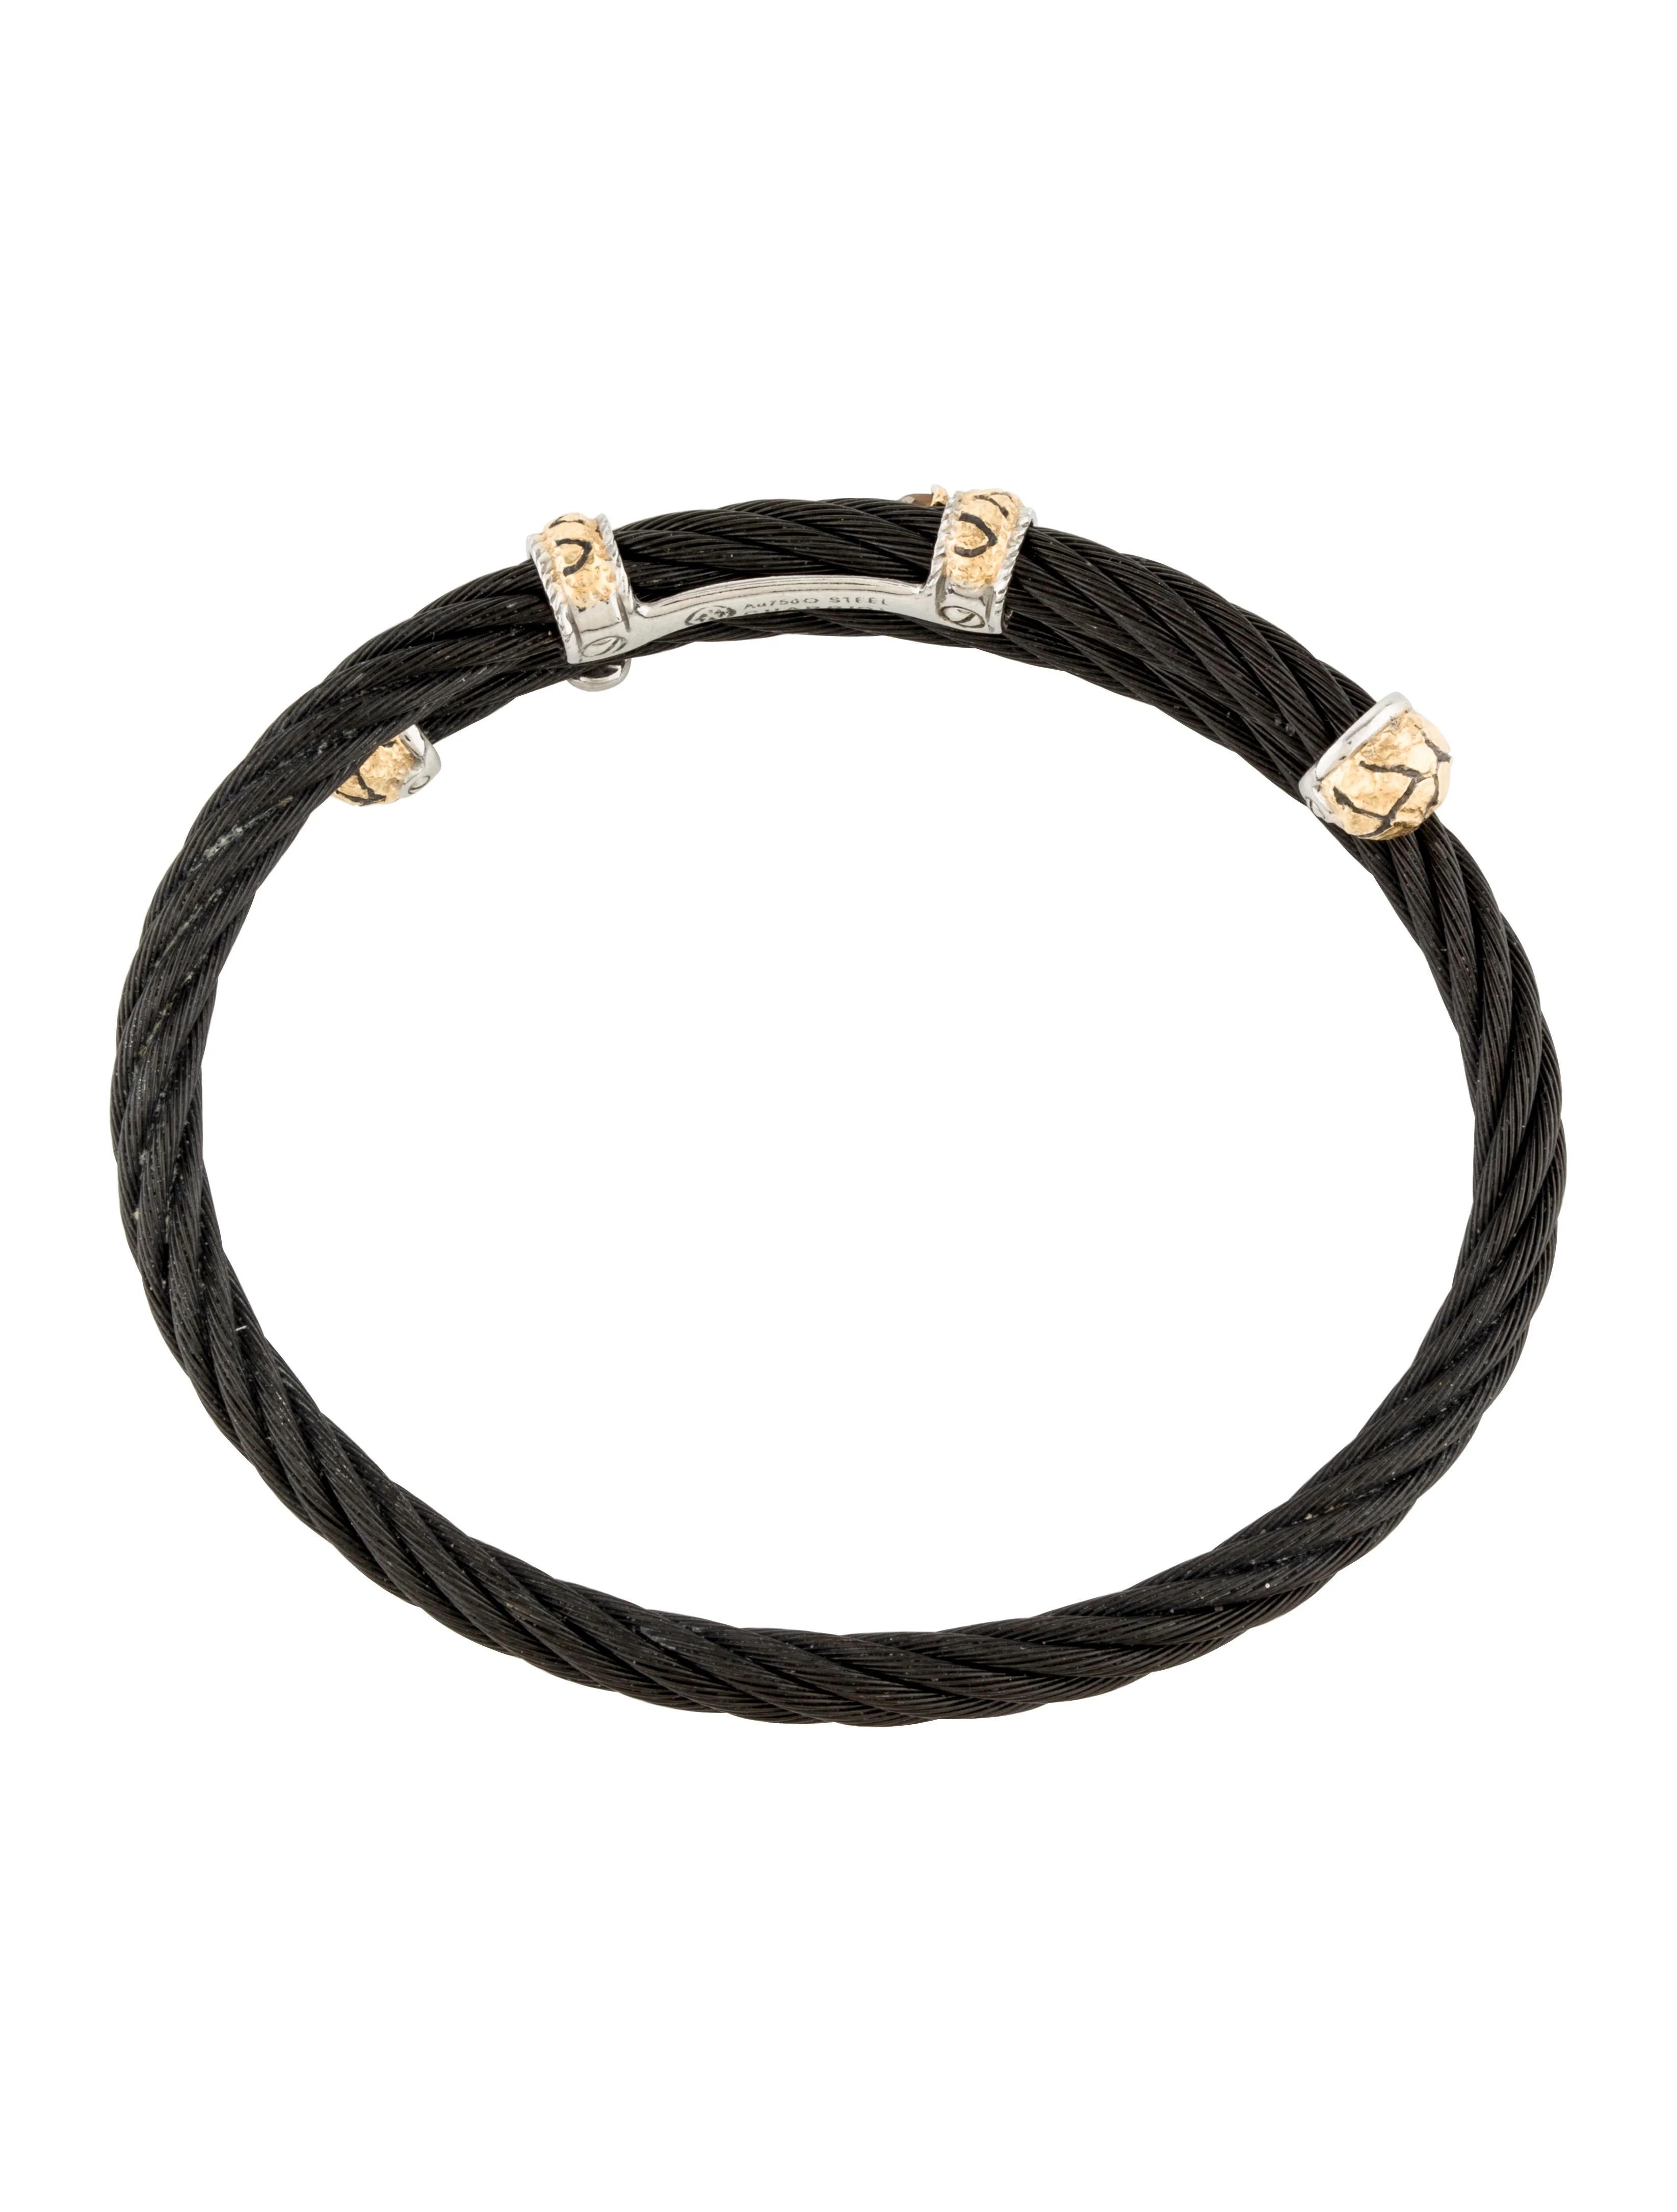 Charriol Two Tone Diamond Cord Bracelet